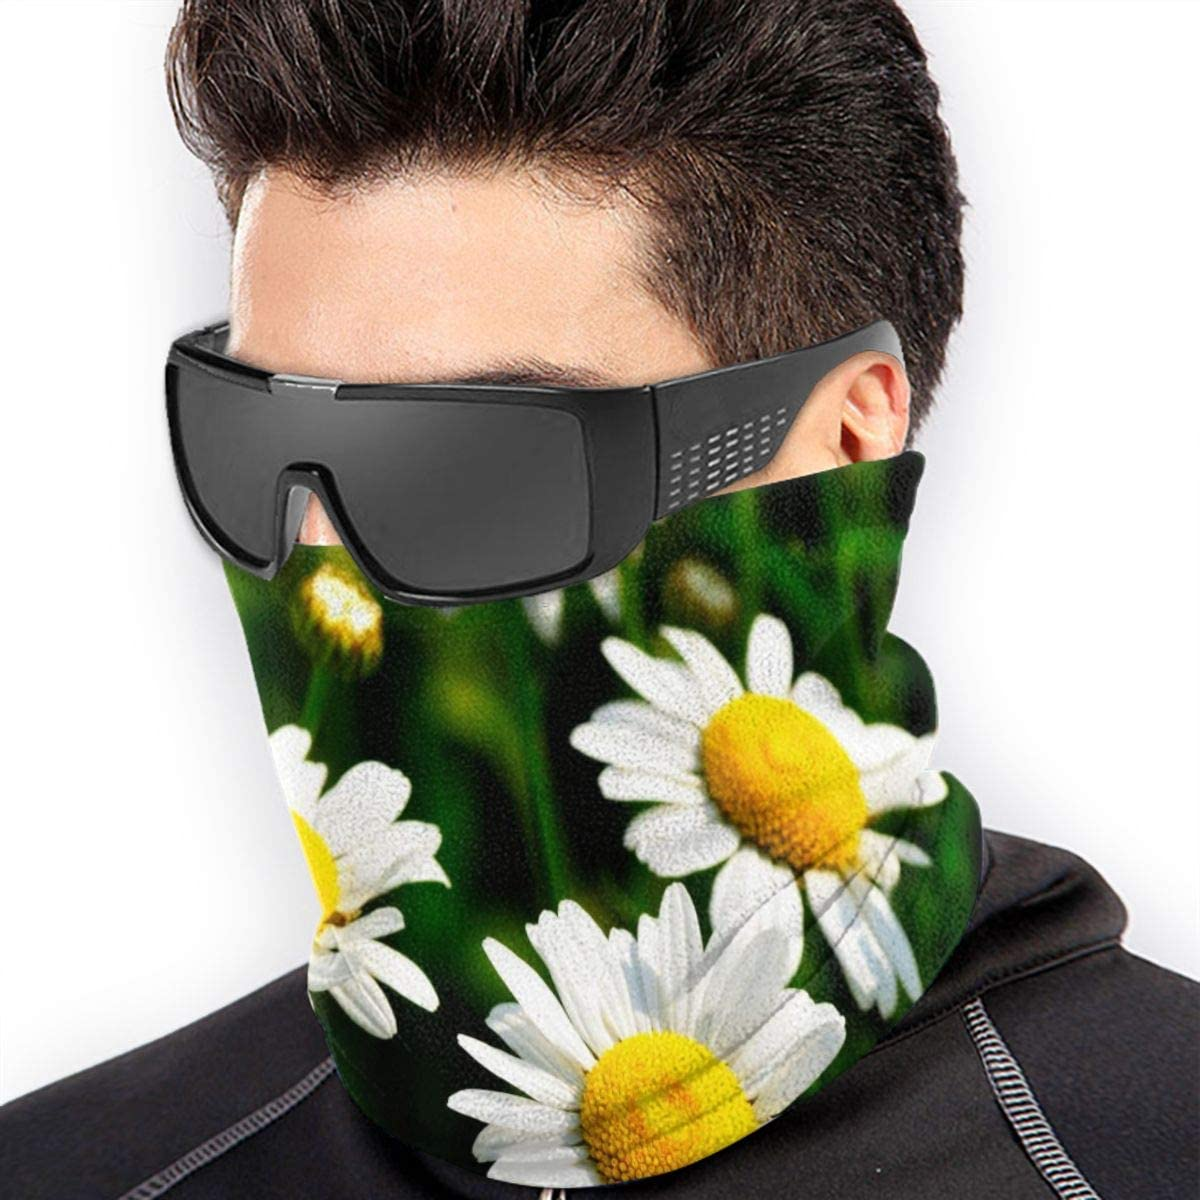 SLHFPX Neck Gaiter Face Mask Chrysanthemum Daisies Floral Flowers Half Balaclava Ski Masks for Women Men Adult